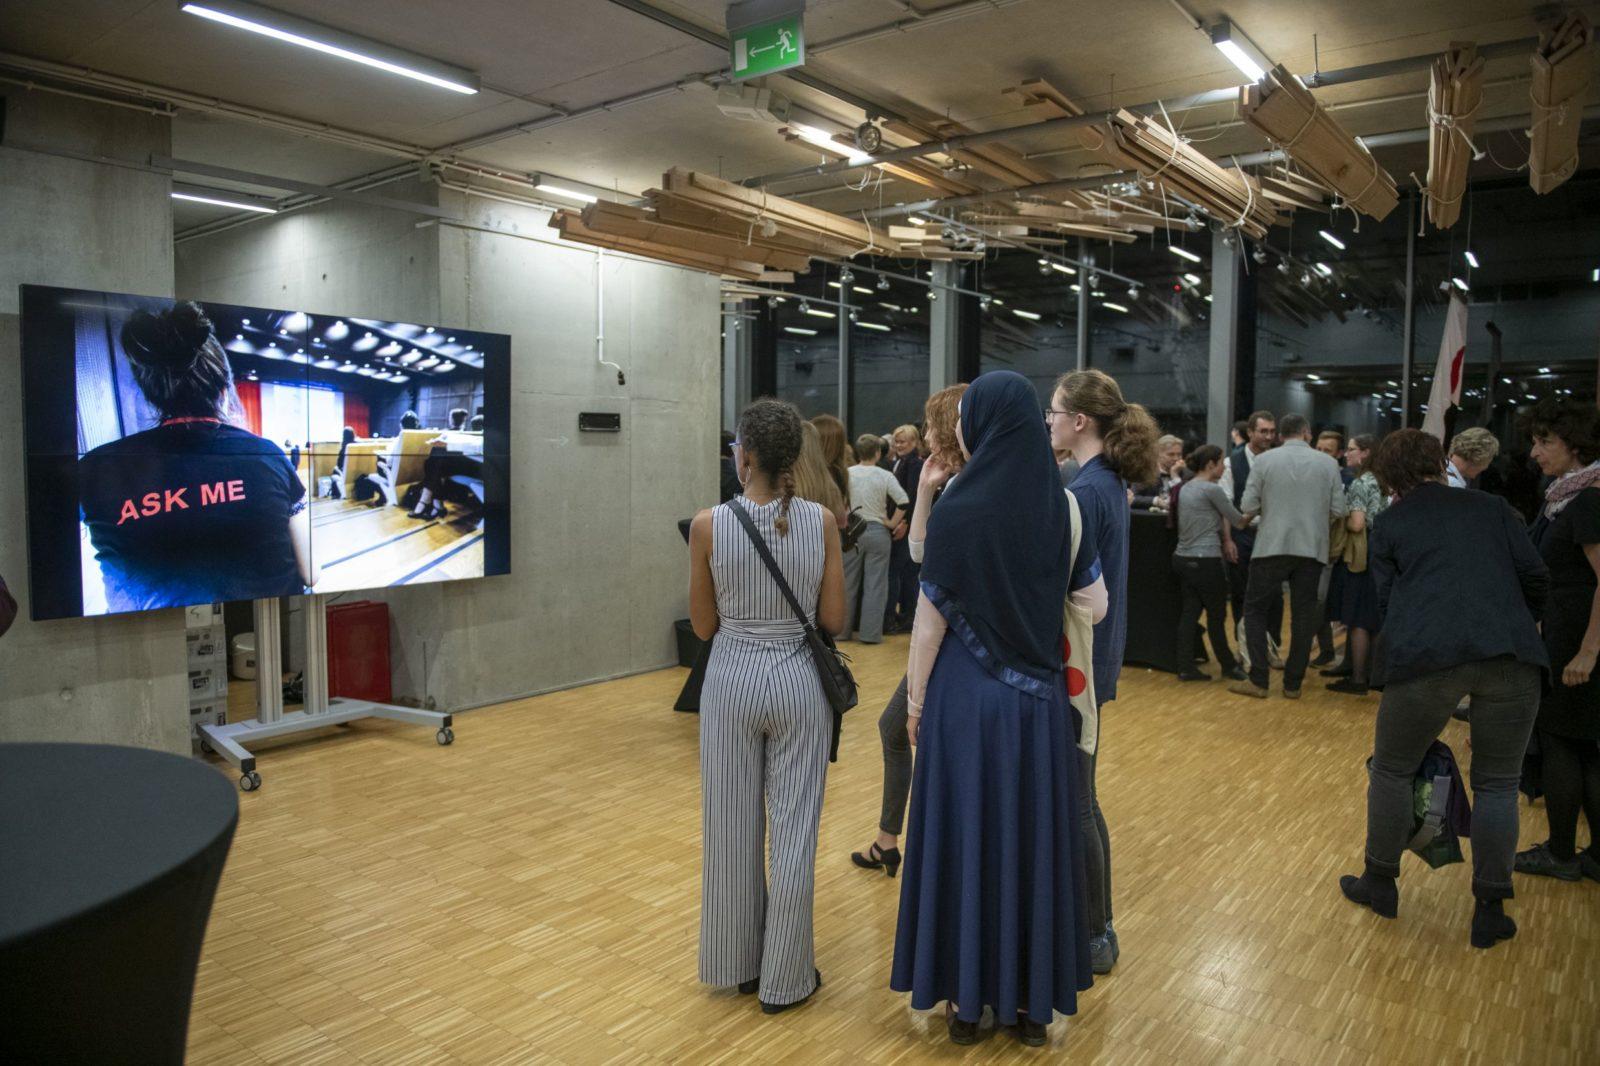 Warschau_2019_Empfang_reception_Thursday_Warsaw_Stasiuk_Konrad_122